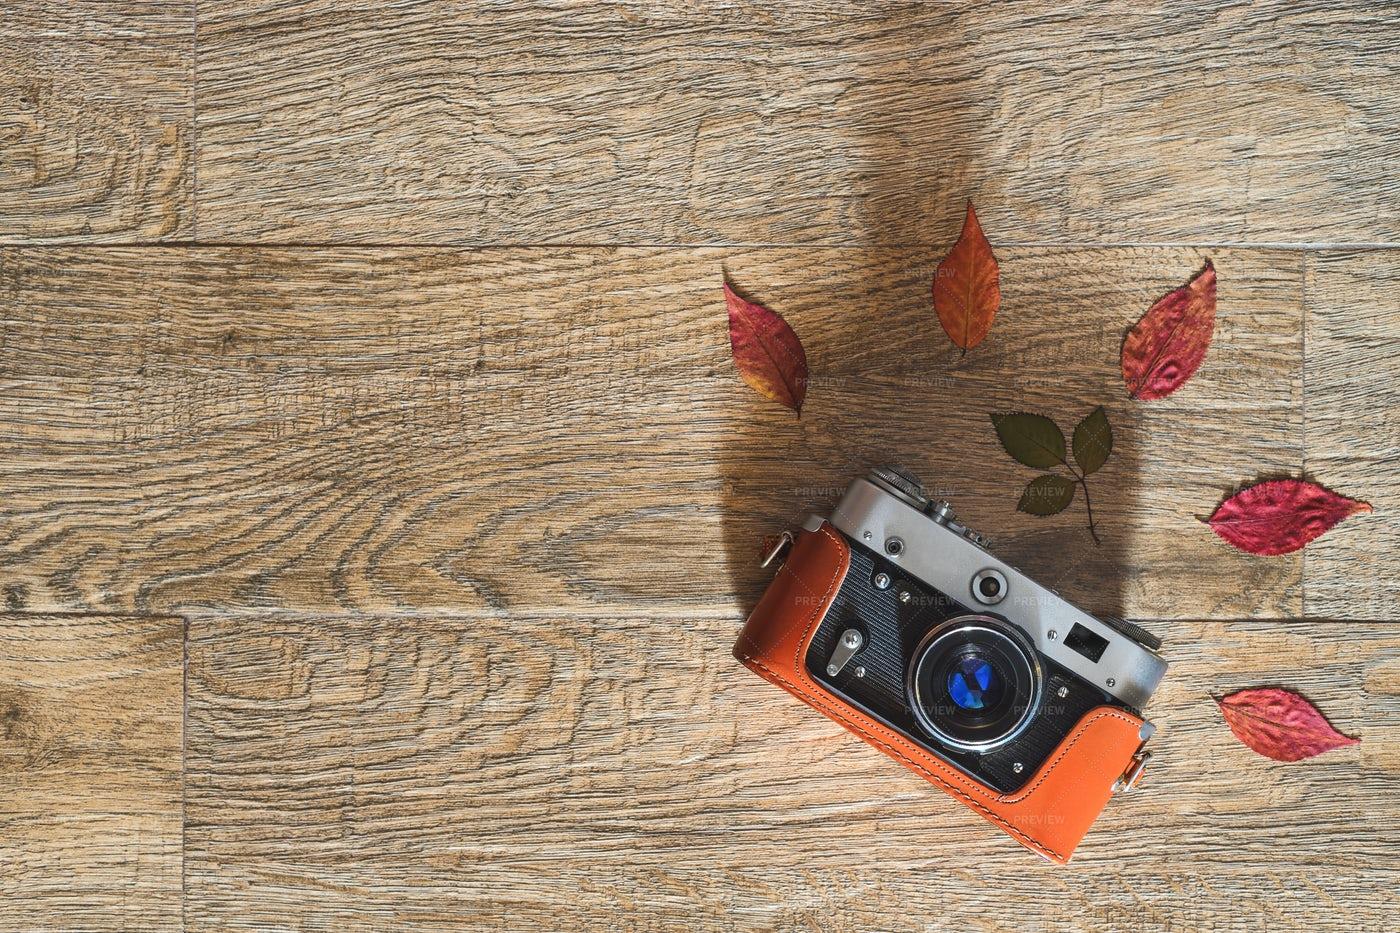 Orange Retro Camera: Stock Photos